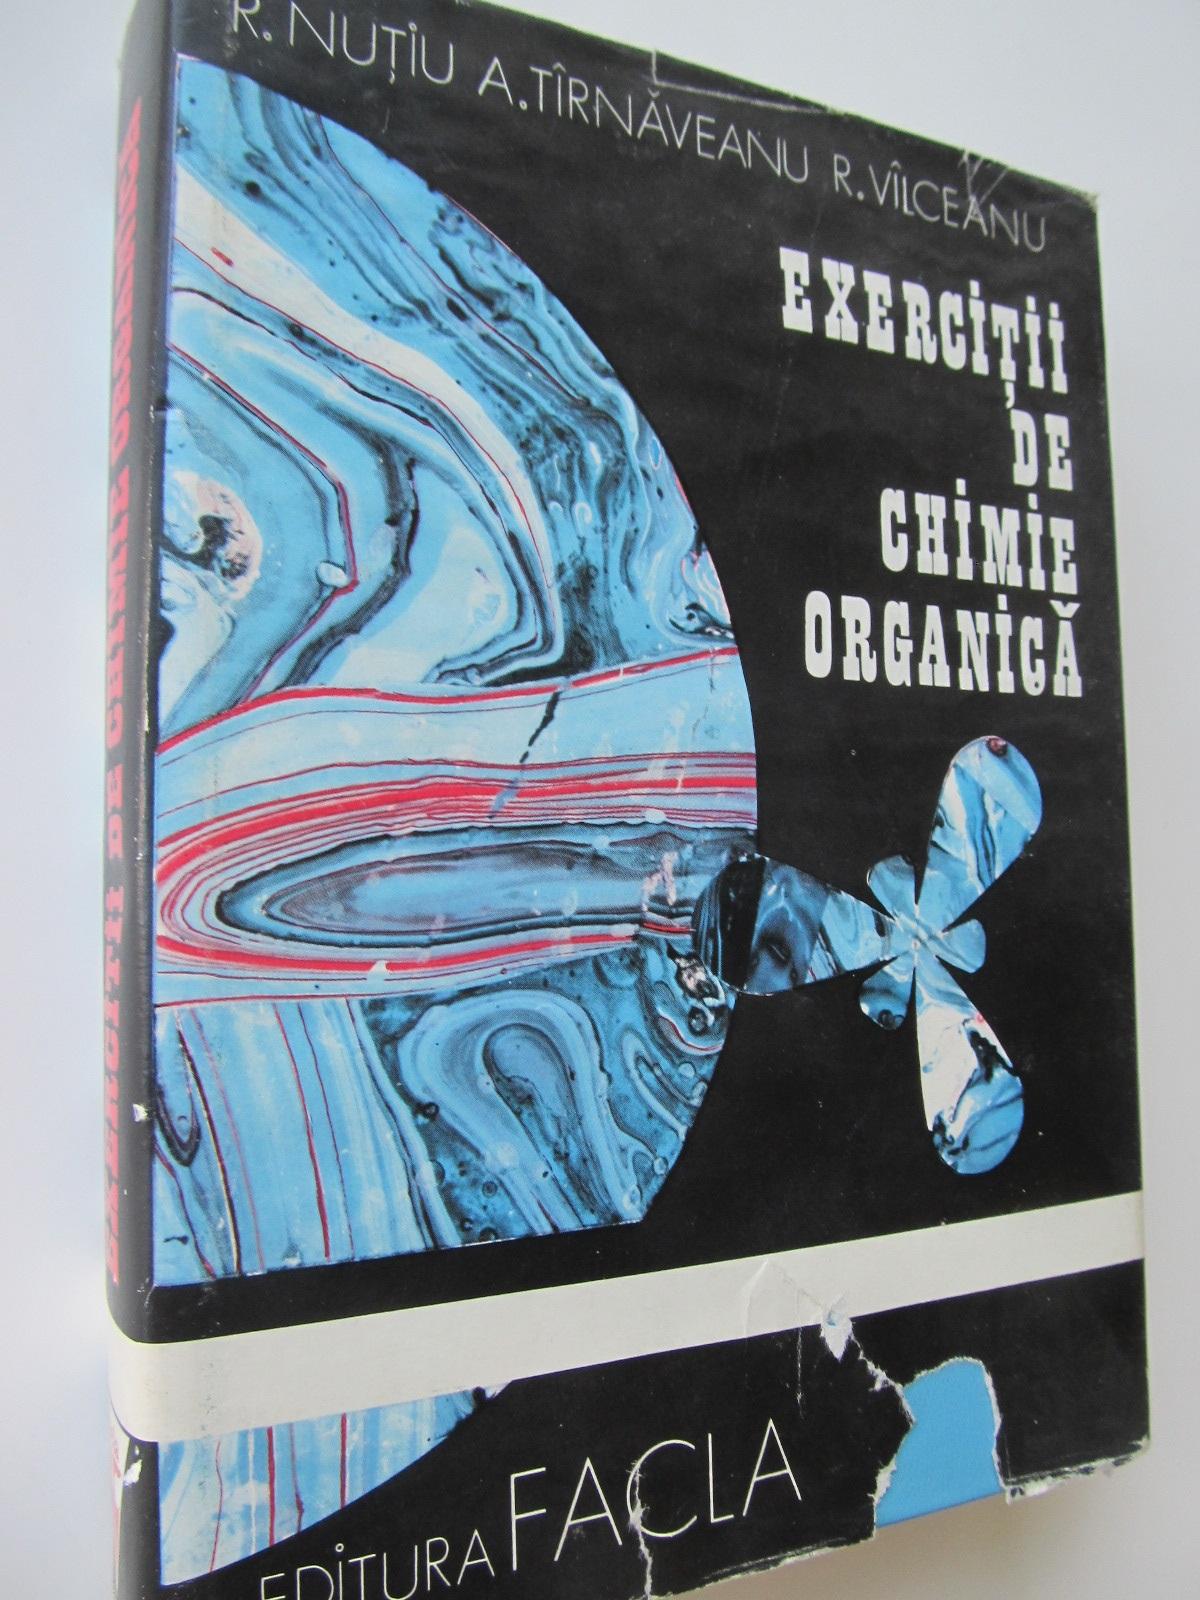 Exercitii de Chimie Organica - R. Nutiu , A. Tarnoveanu , R. Valceanu | Detalii carte